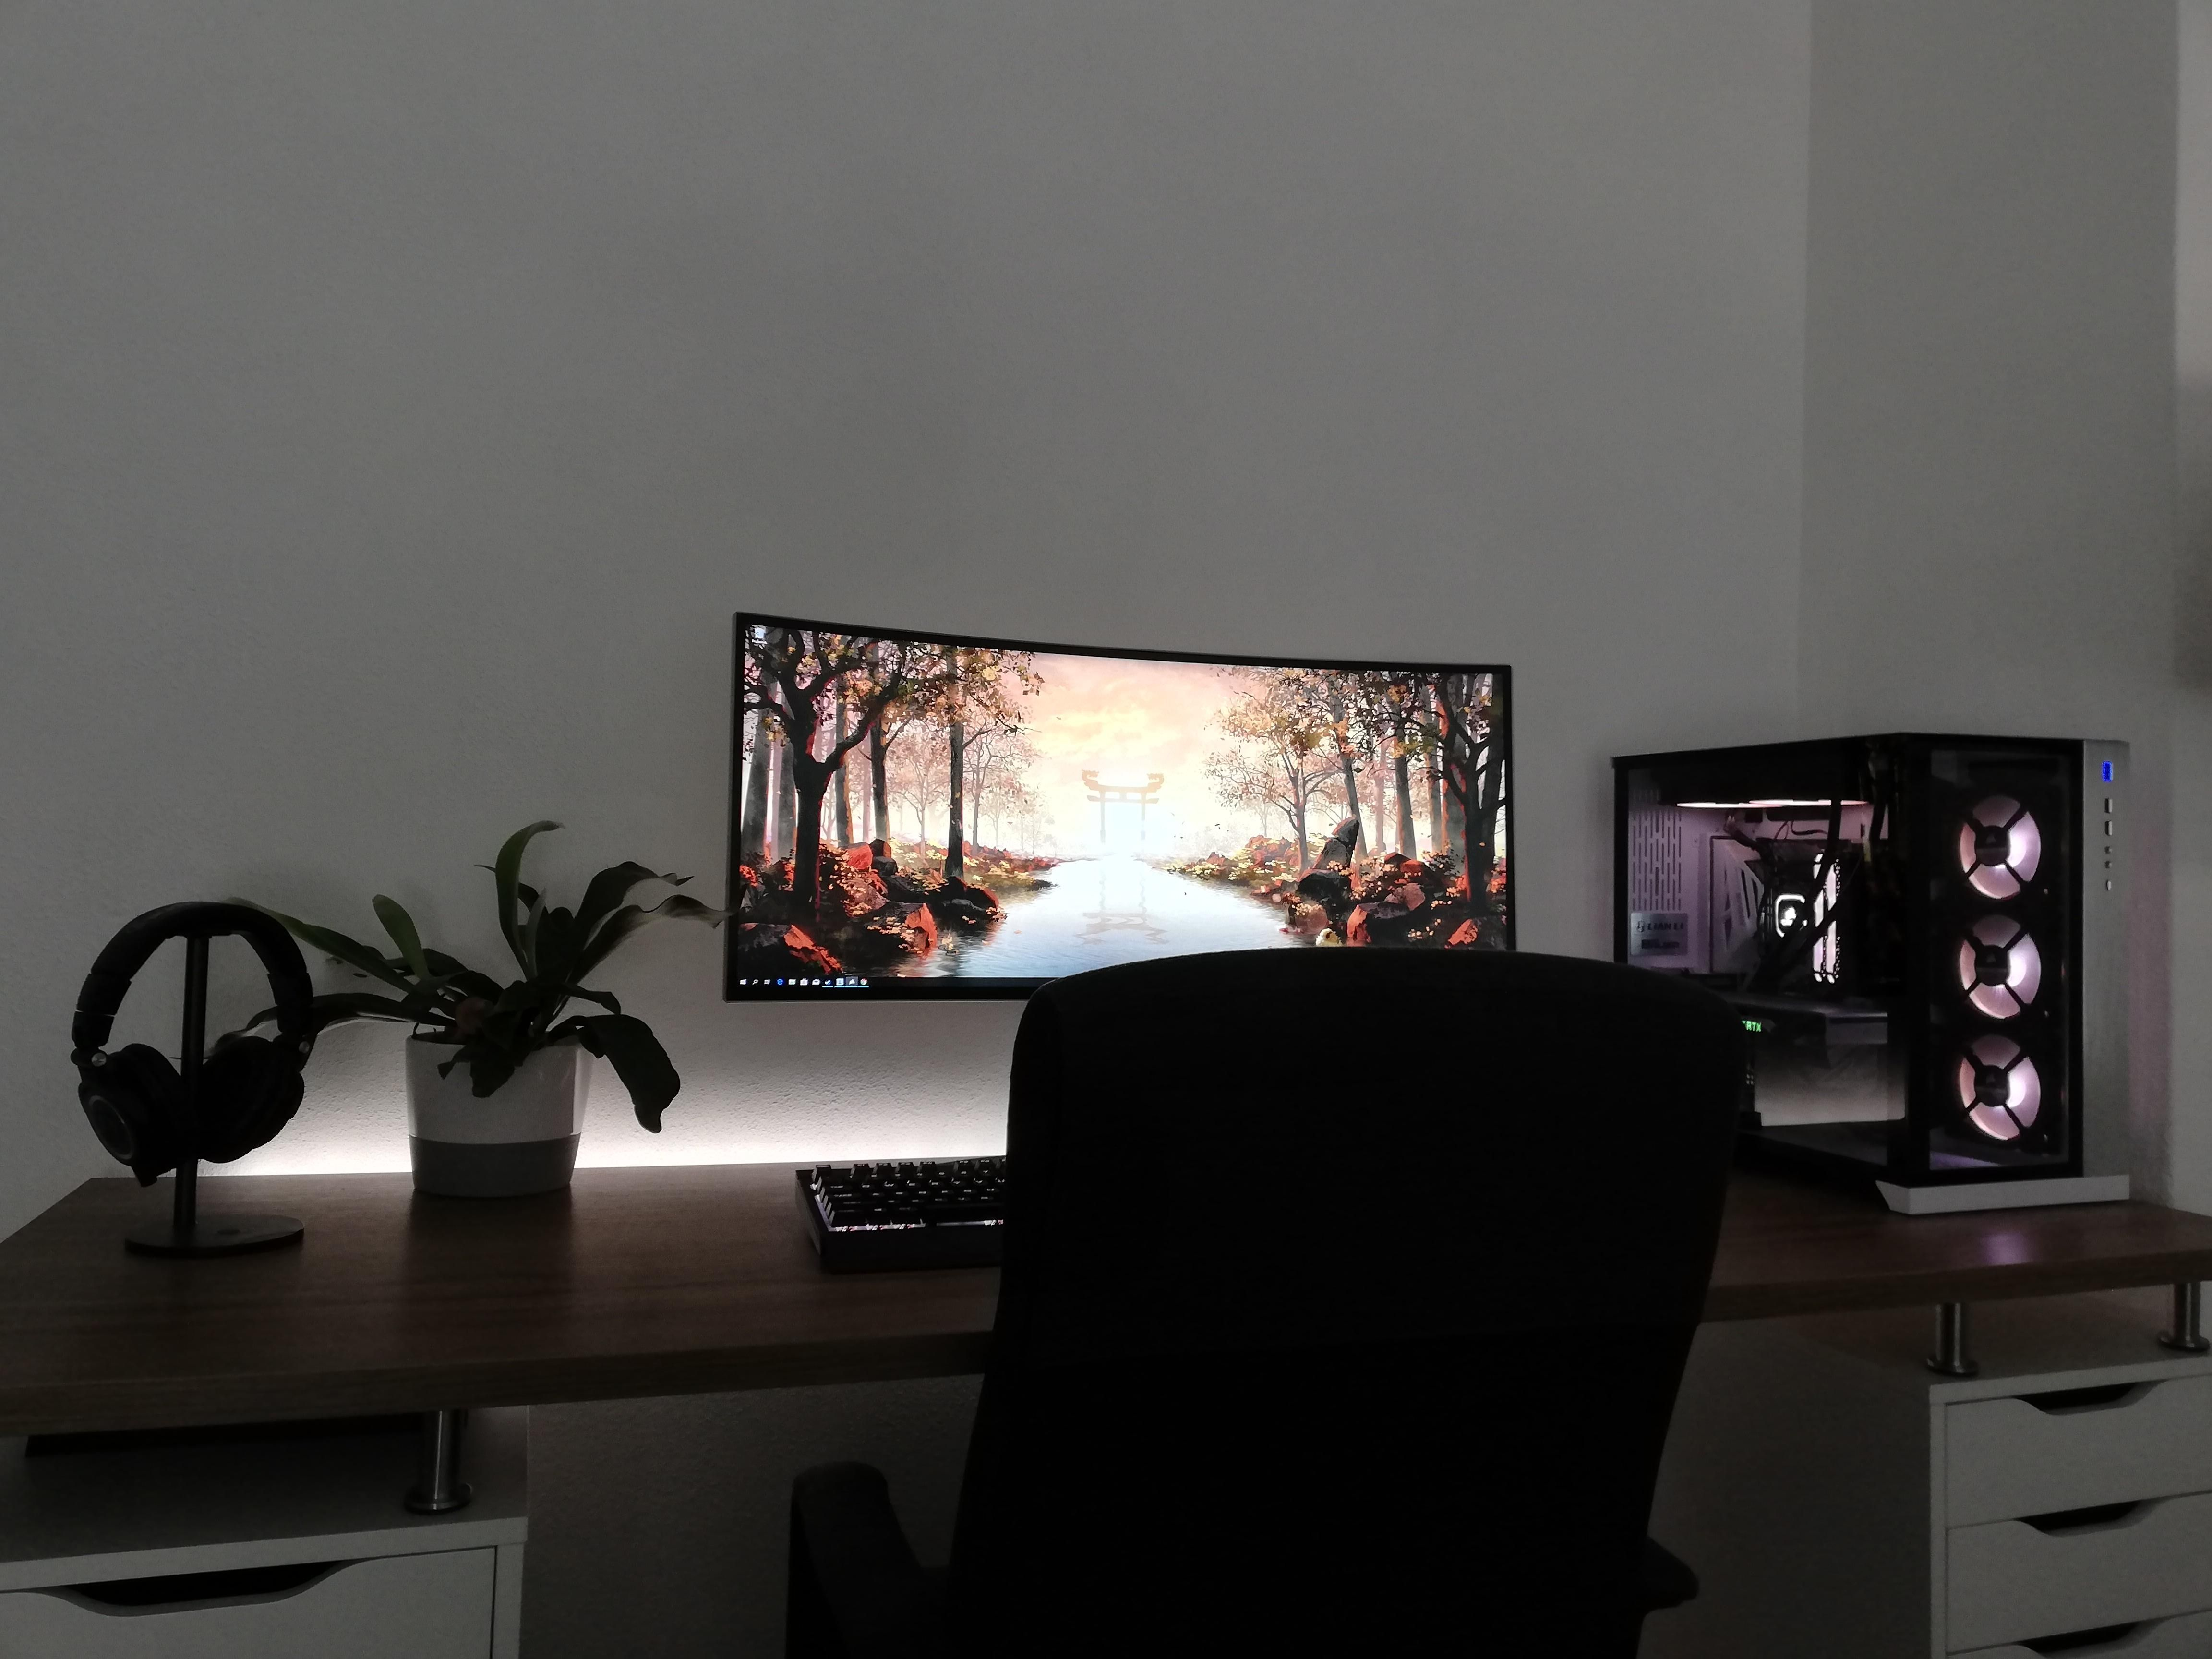 Clean Single Monitor Setup Living Room Gaming Setup Game Room Design Gaming Room Setup Bedrooms Living room gaming pc